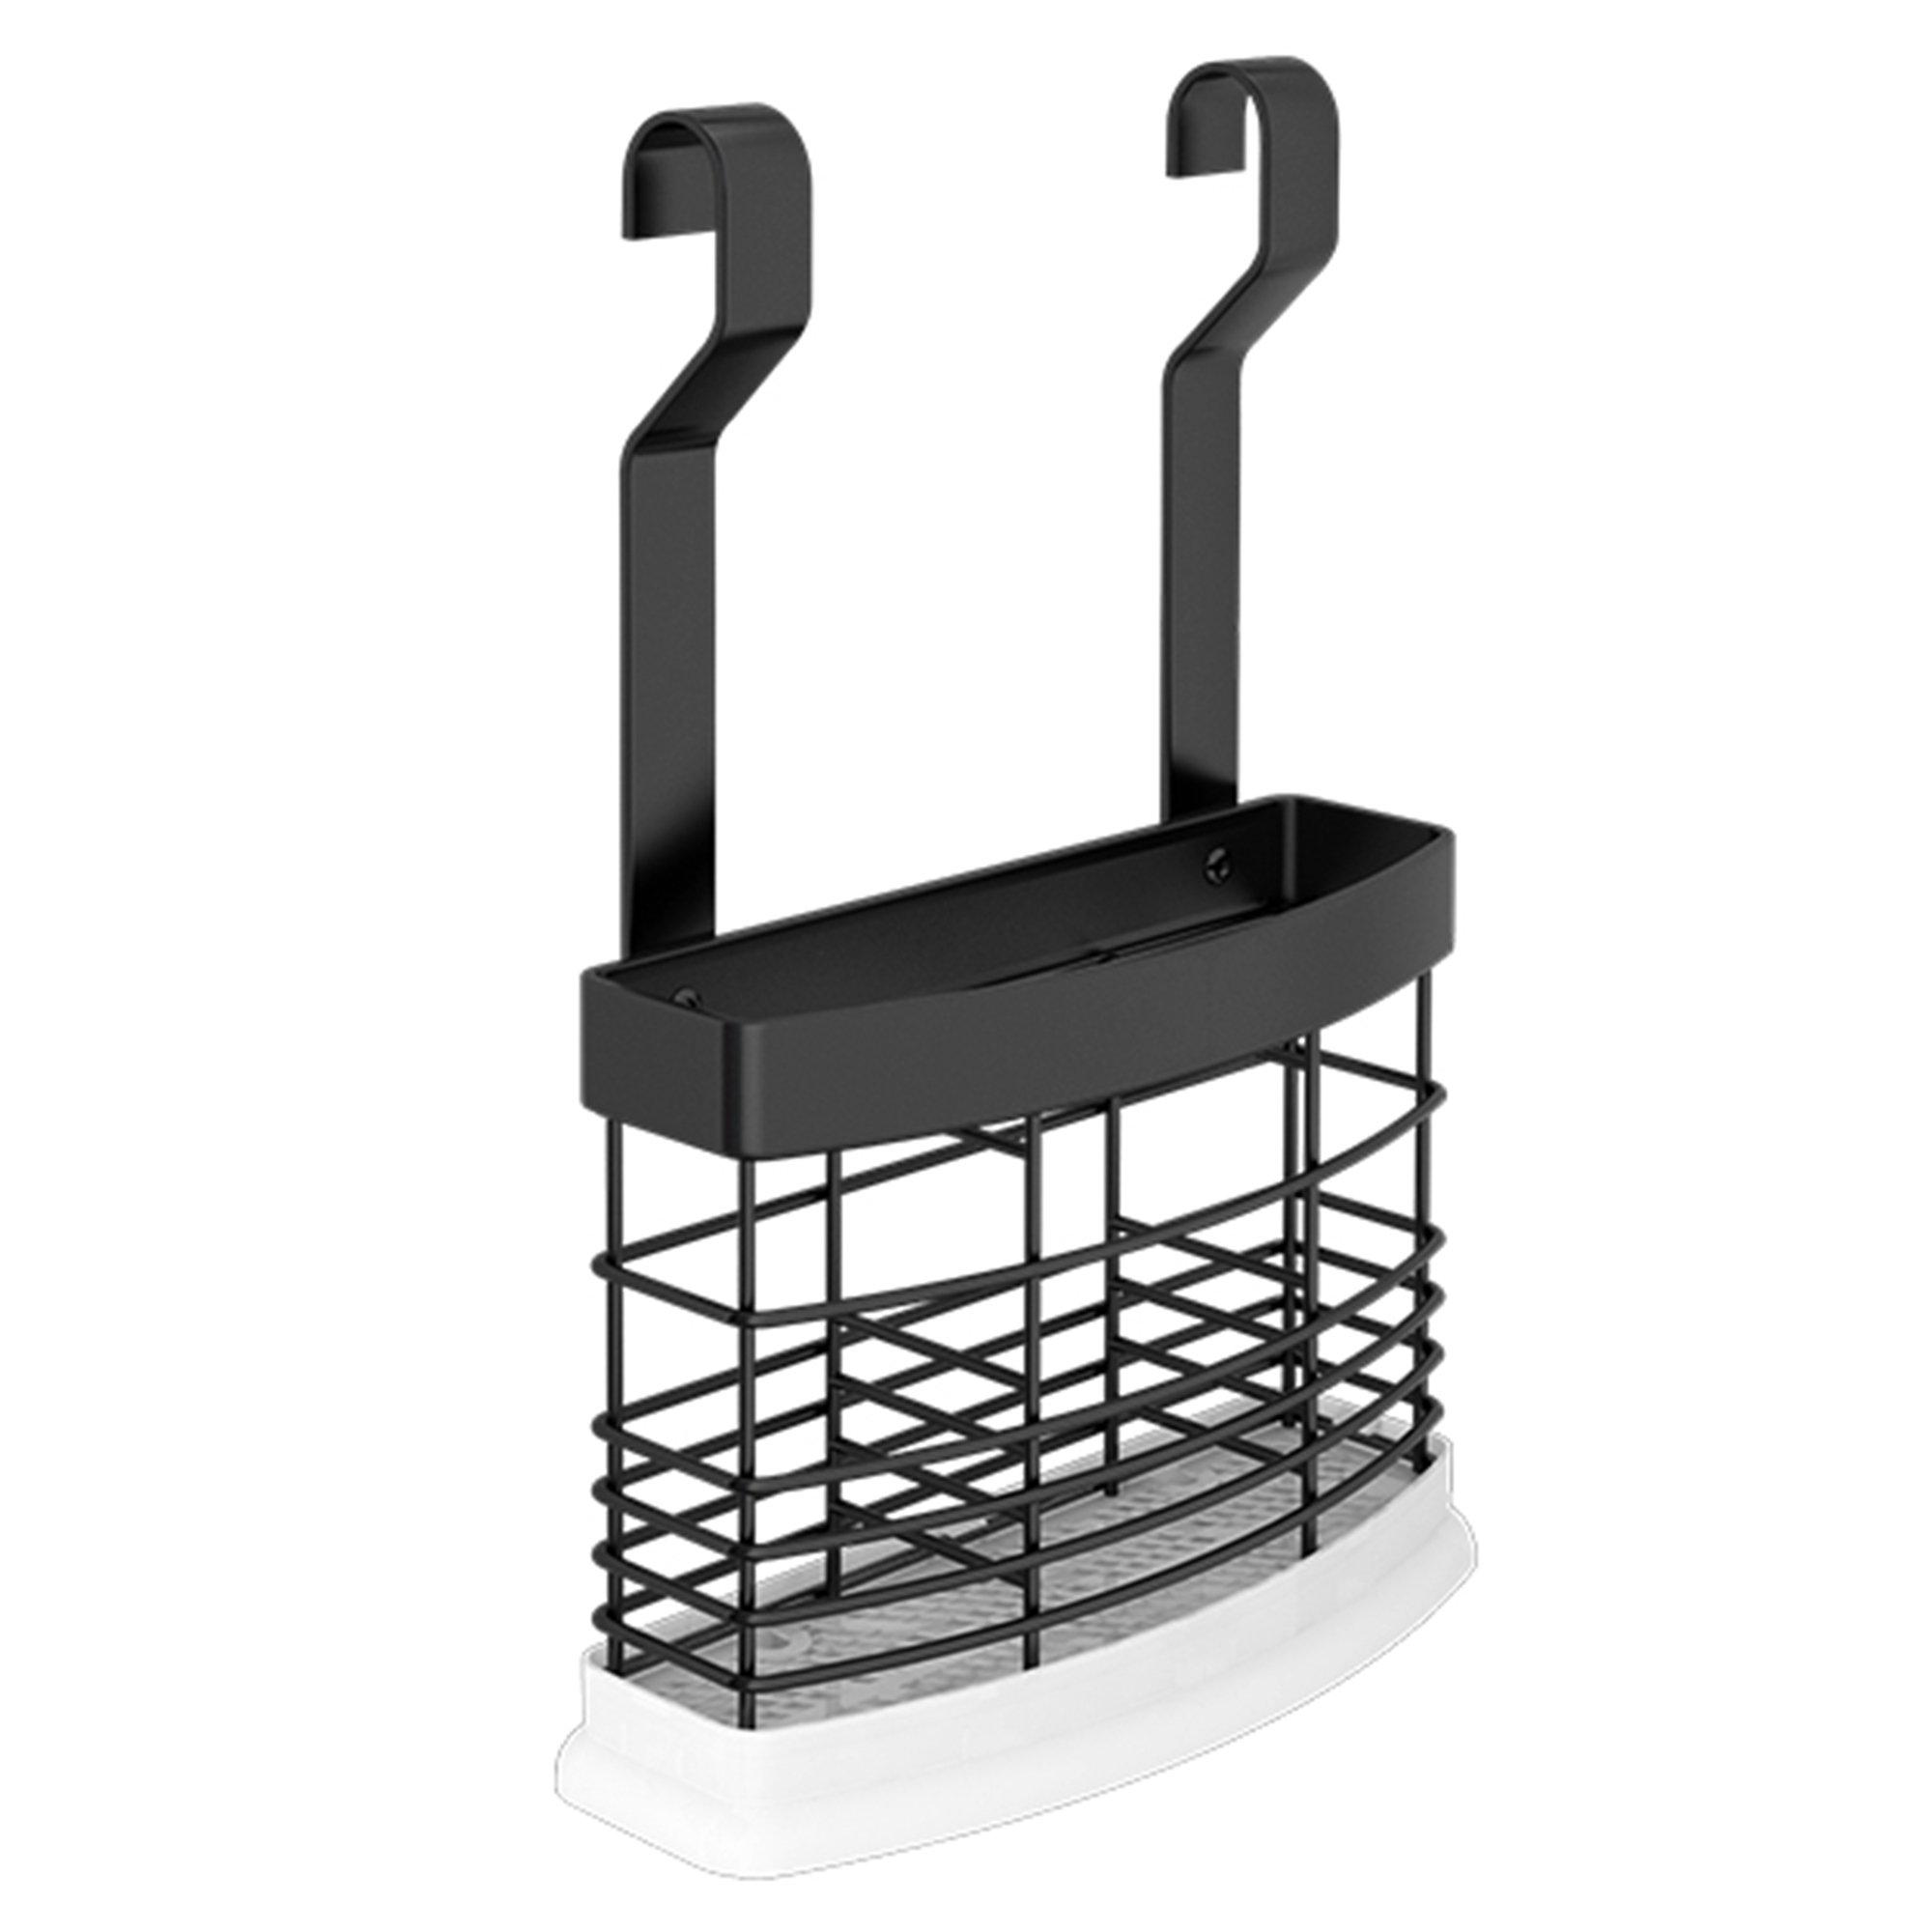 Stainless Steel Rail Cutlery Basket